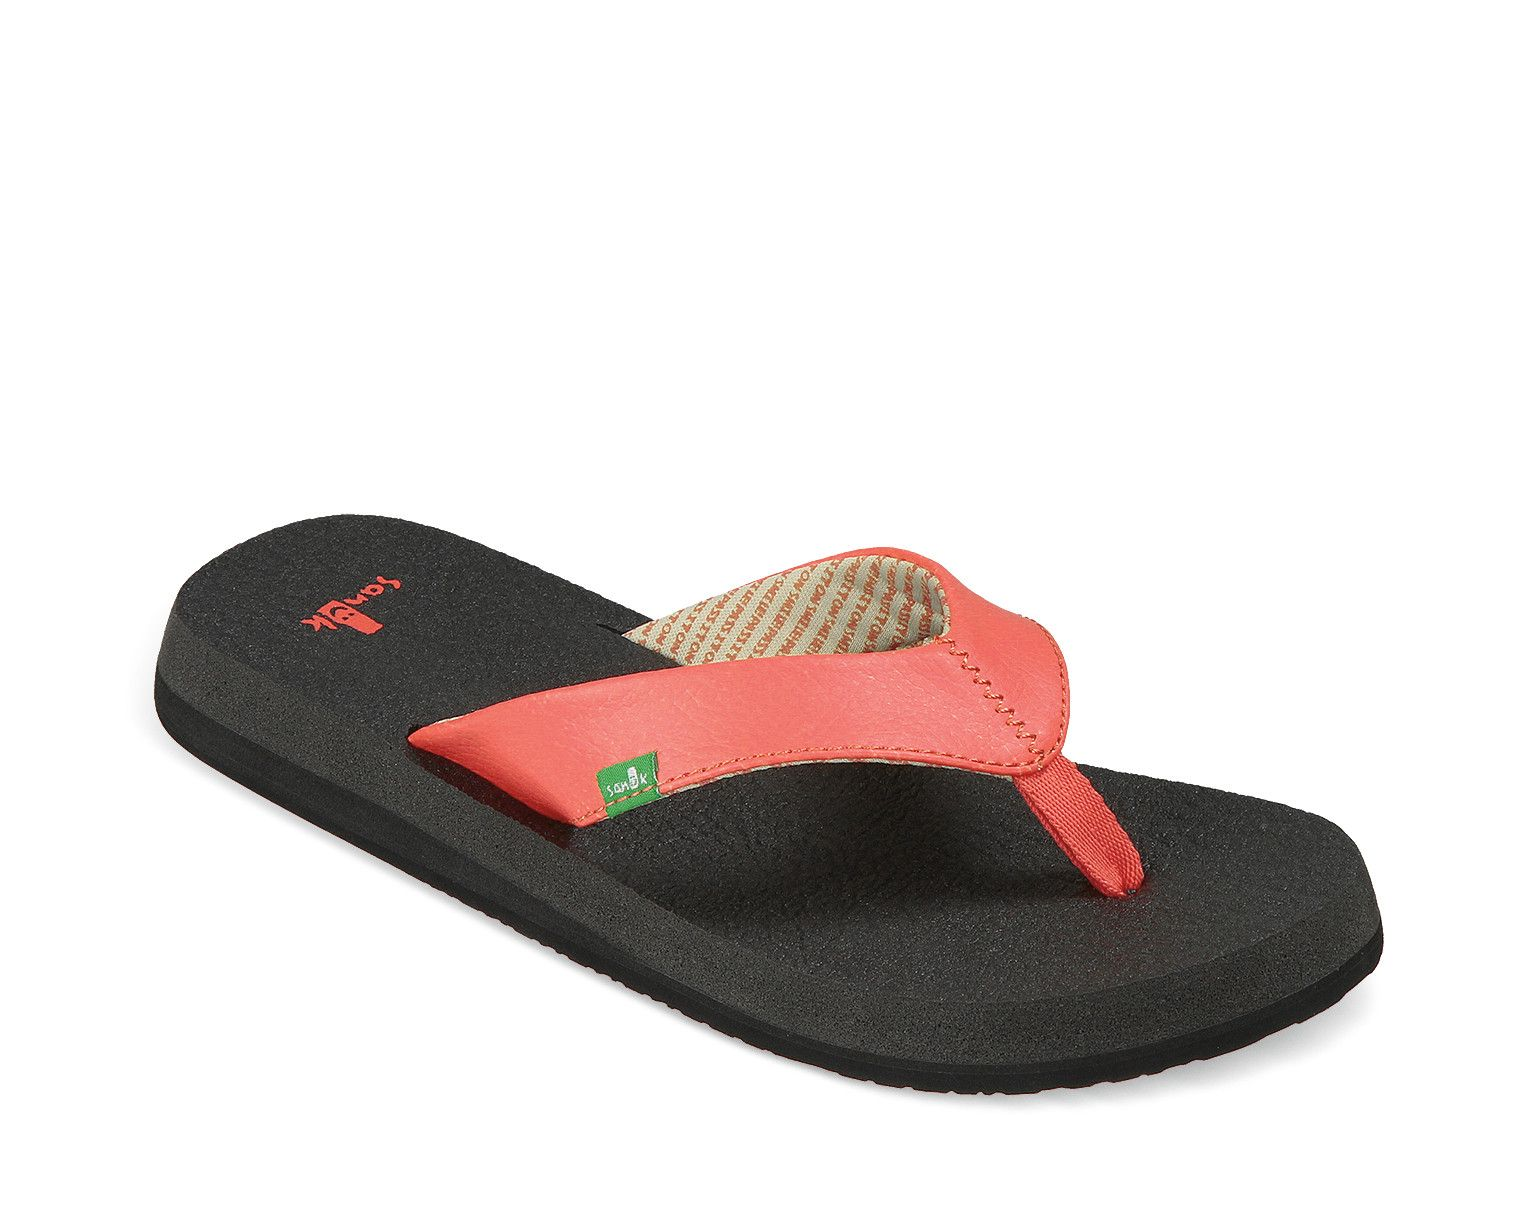 SANUK- Women's Yoga Mat Sandal Watermelon